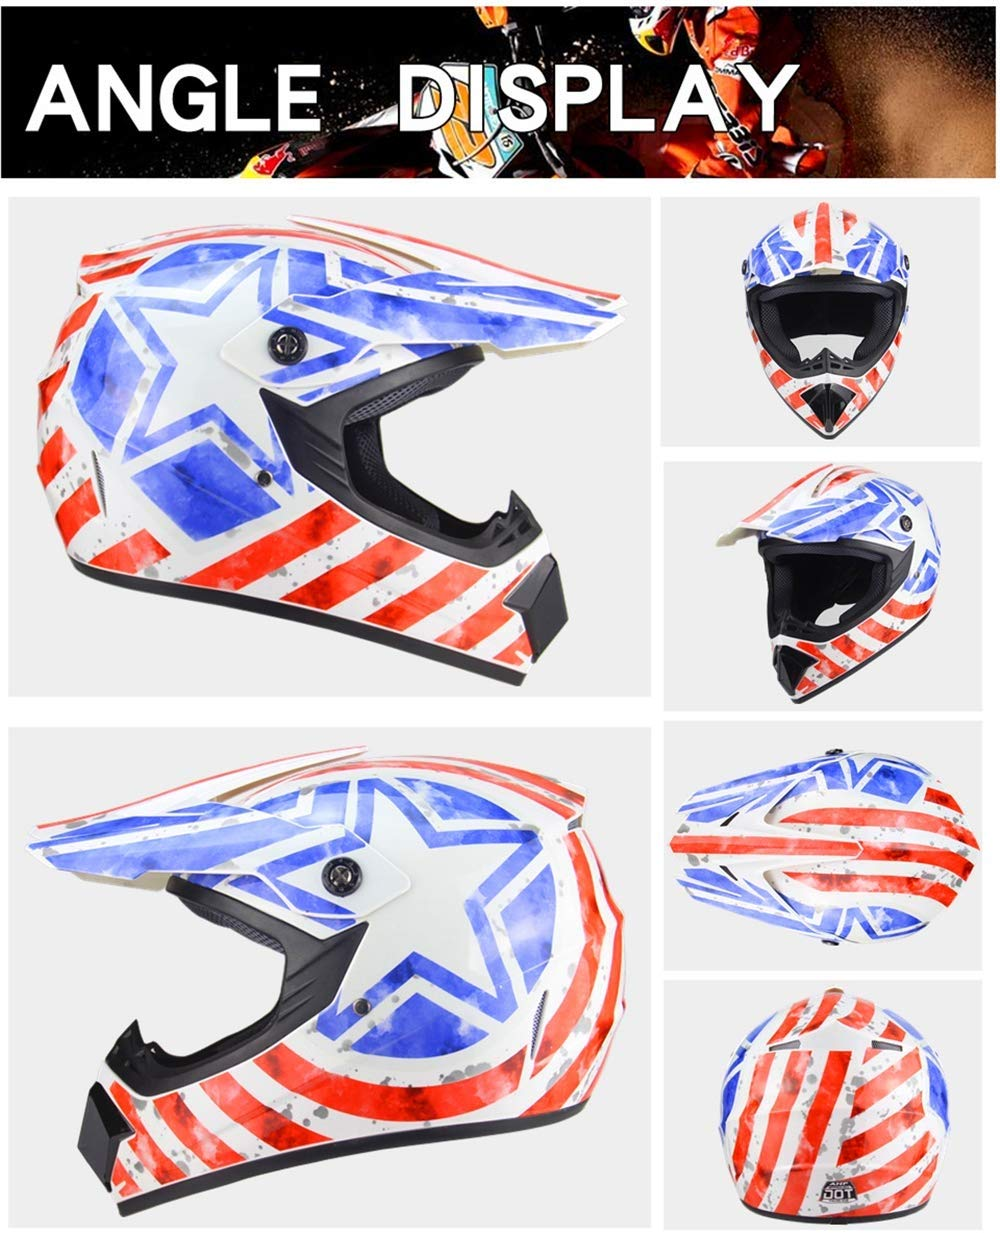 LS Helm Safe Full Face Classic Fahrrad MTB Dh Racing Helm Motocross Downhill Fahrradhelm Capacetes Motocross F/ür Erwachsene Jugend Junior Kinder Kinder,A,S